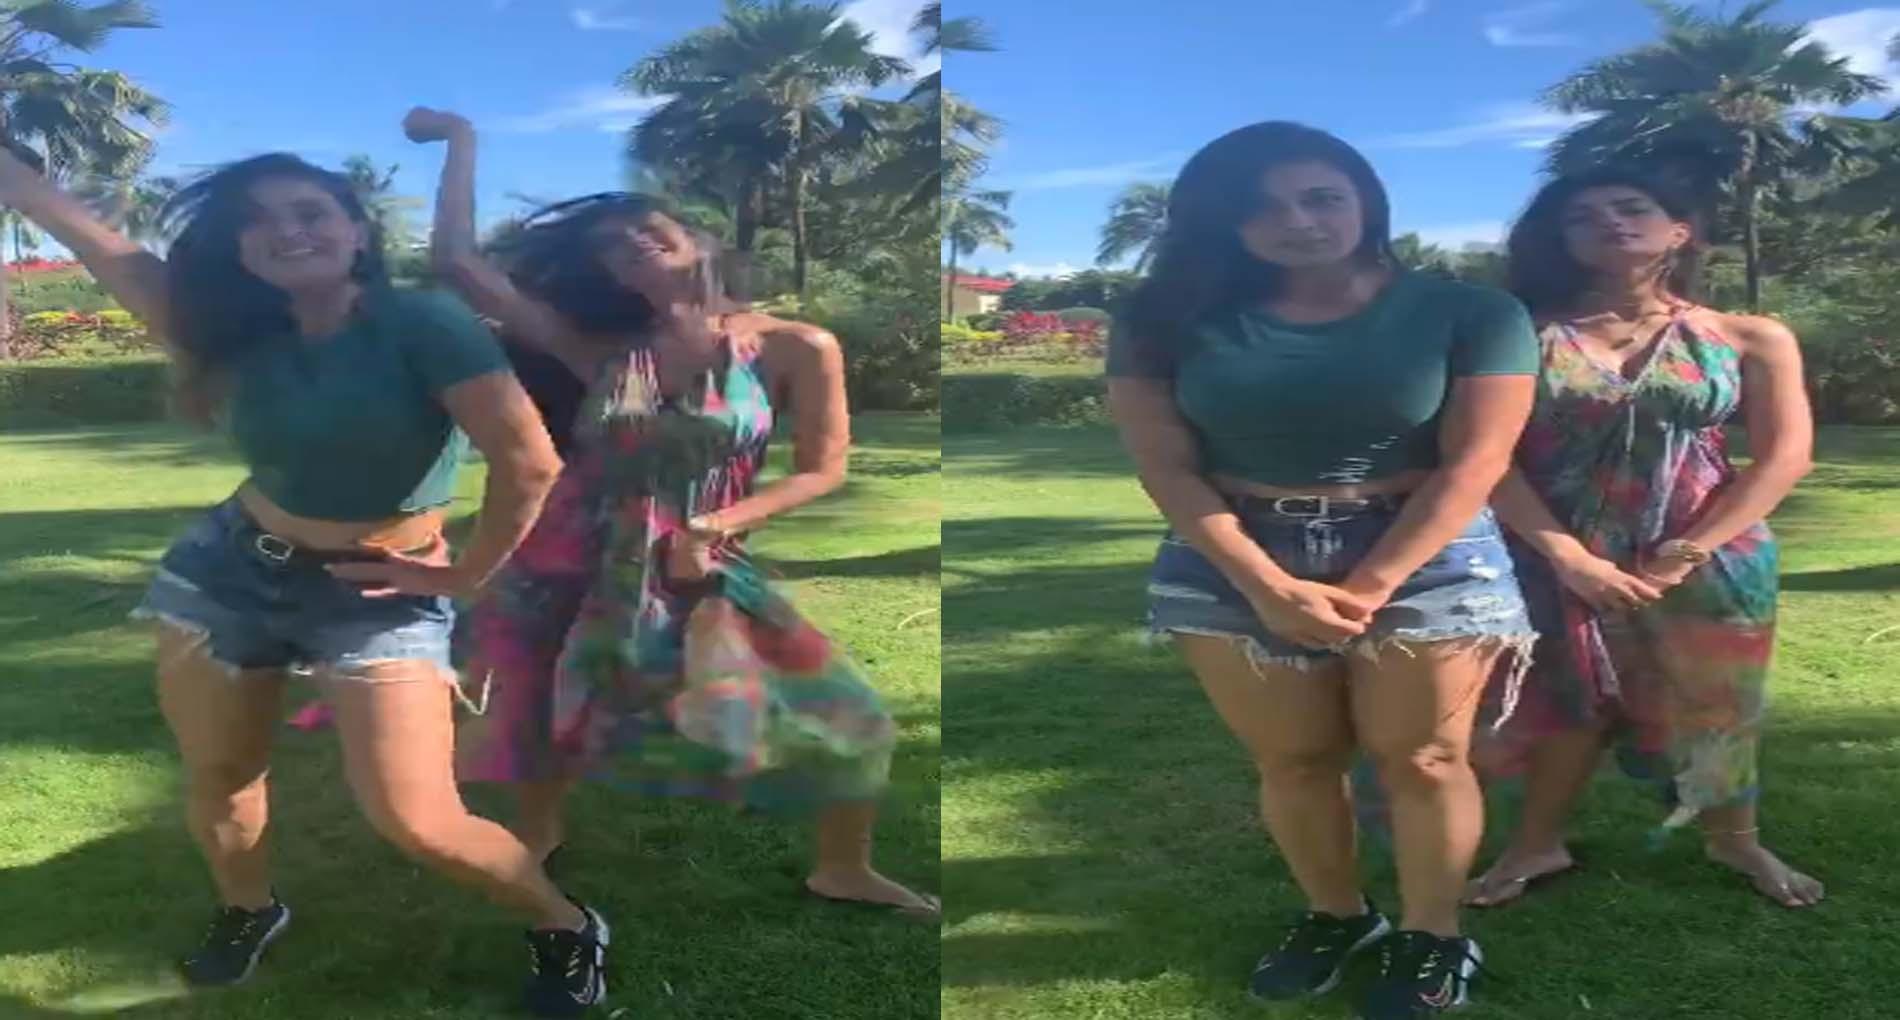 Palak Tiwari Video: मां संग मस्ती करती नजर आईं पलक तिवारी! वीडियो हुआ वायरल